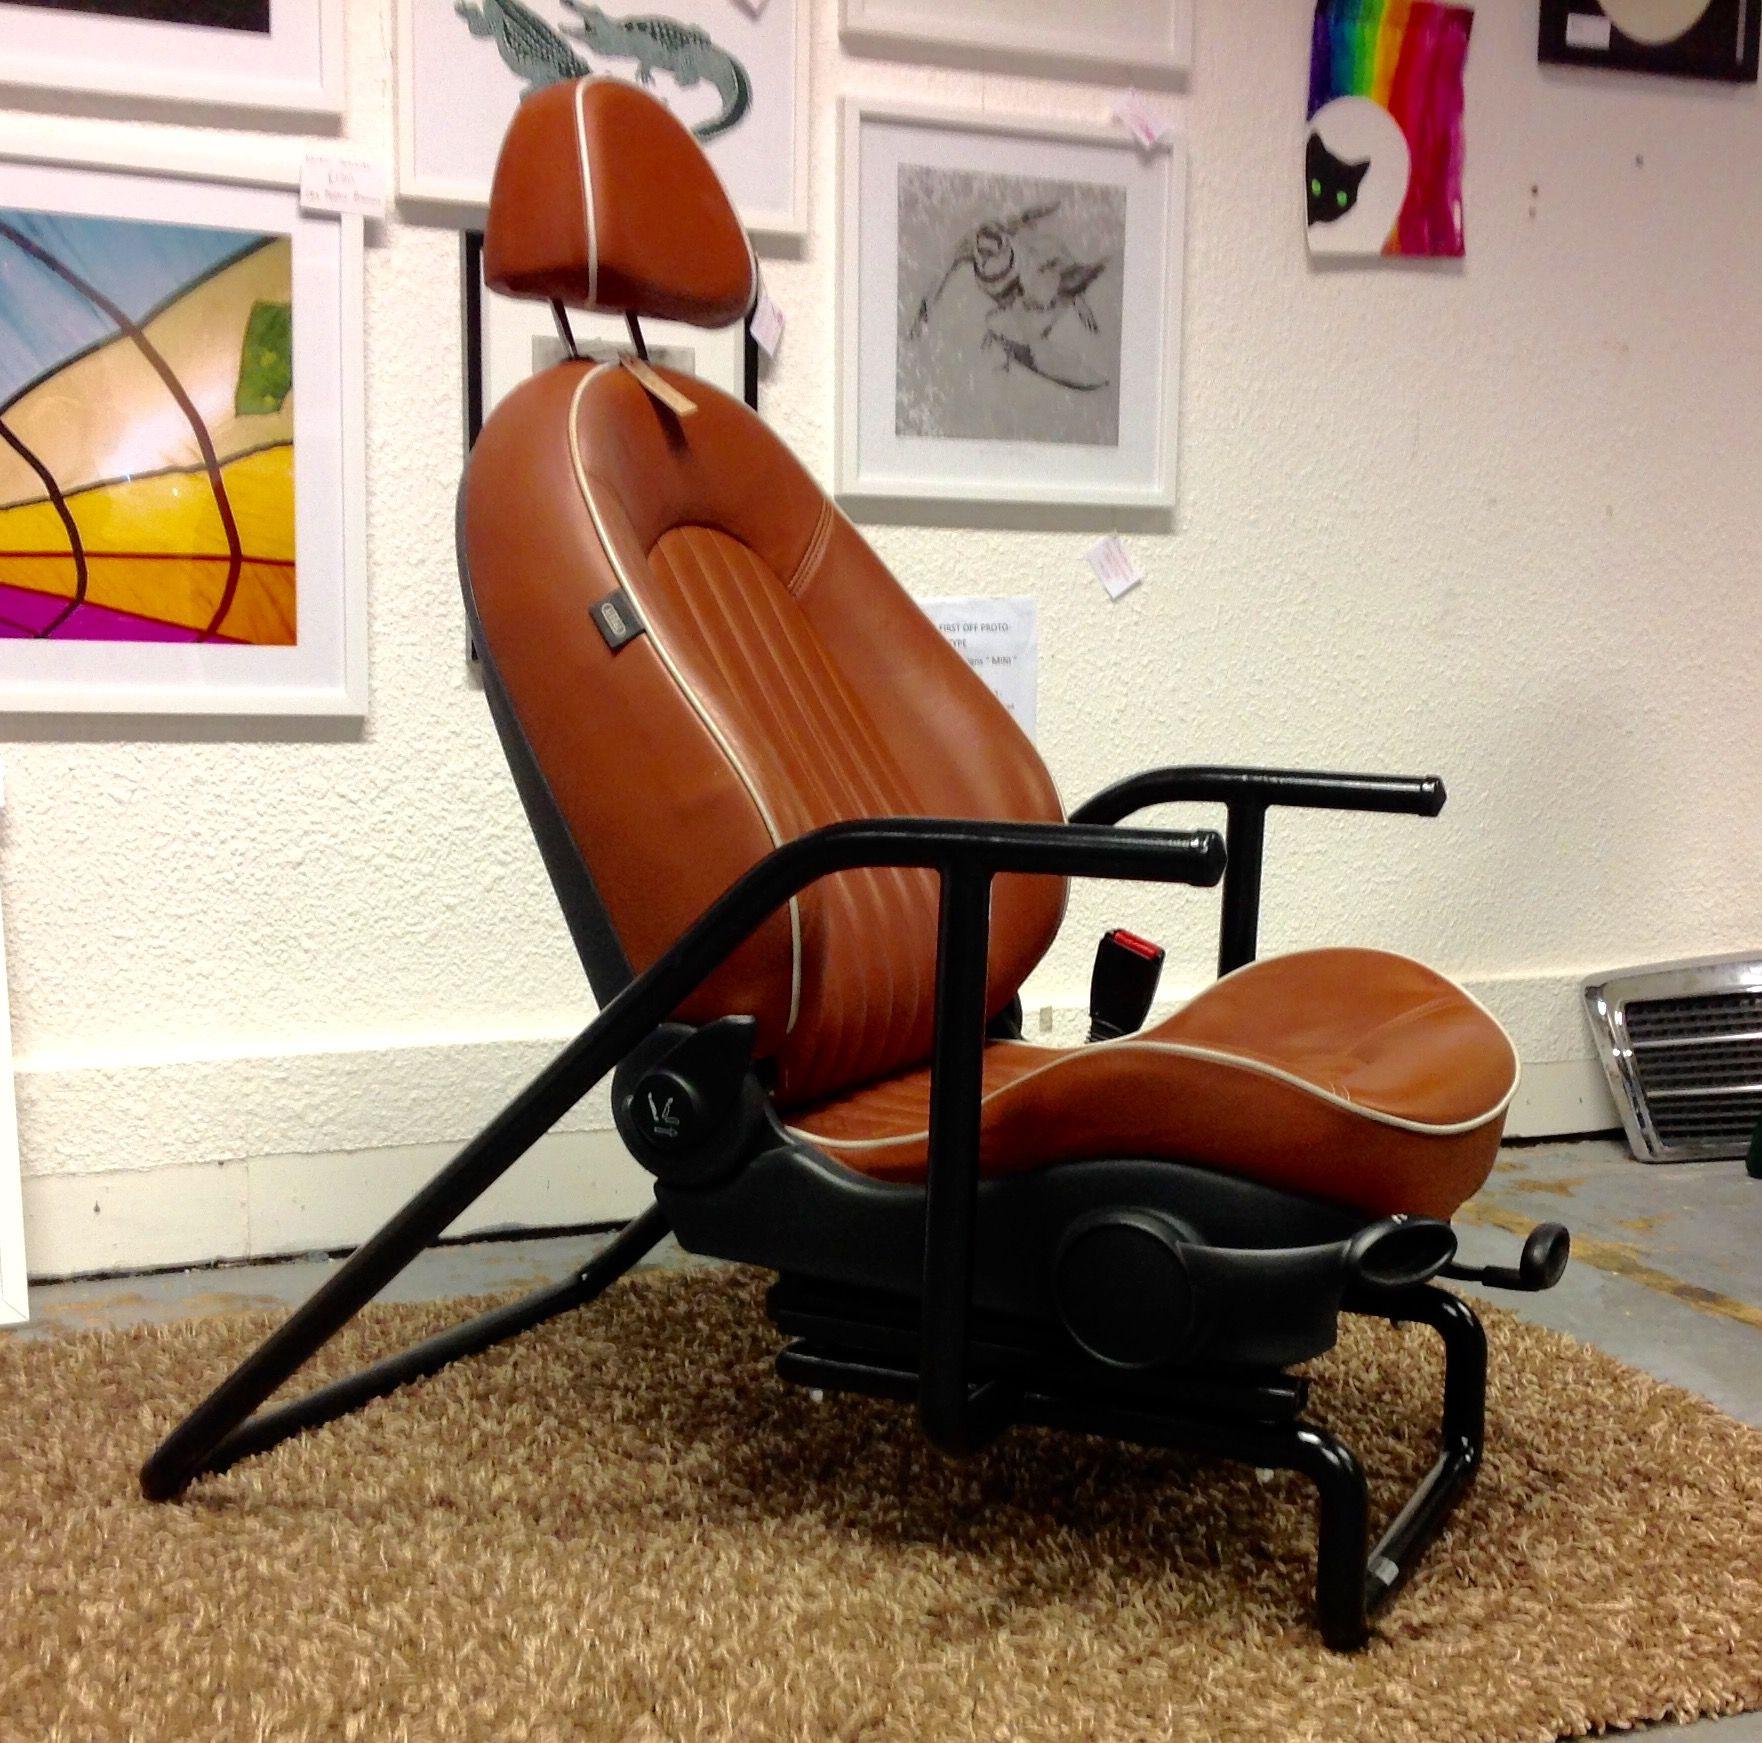 Mini prototype, slide, raise, lumber, recliner all working